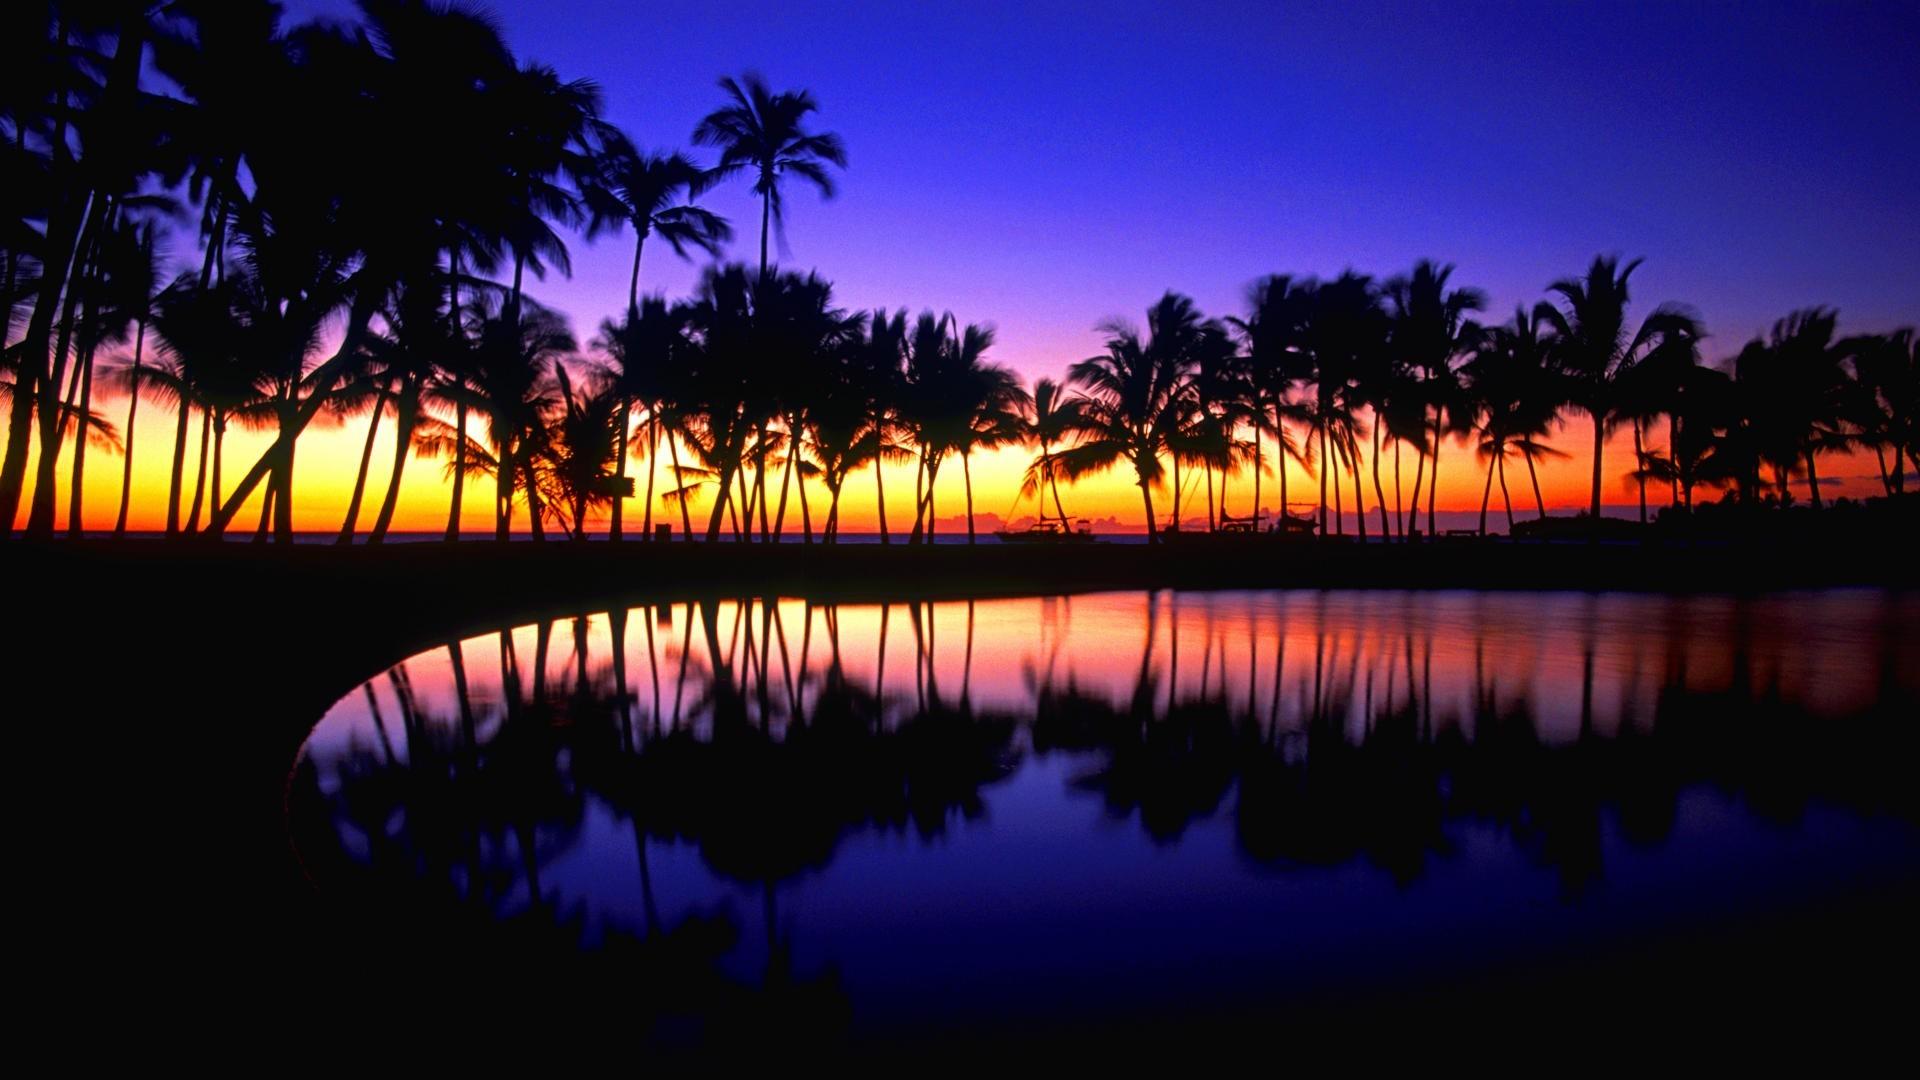 Hawaii Tropical Wallpaper Hawaii, Tropical, Reflections